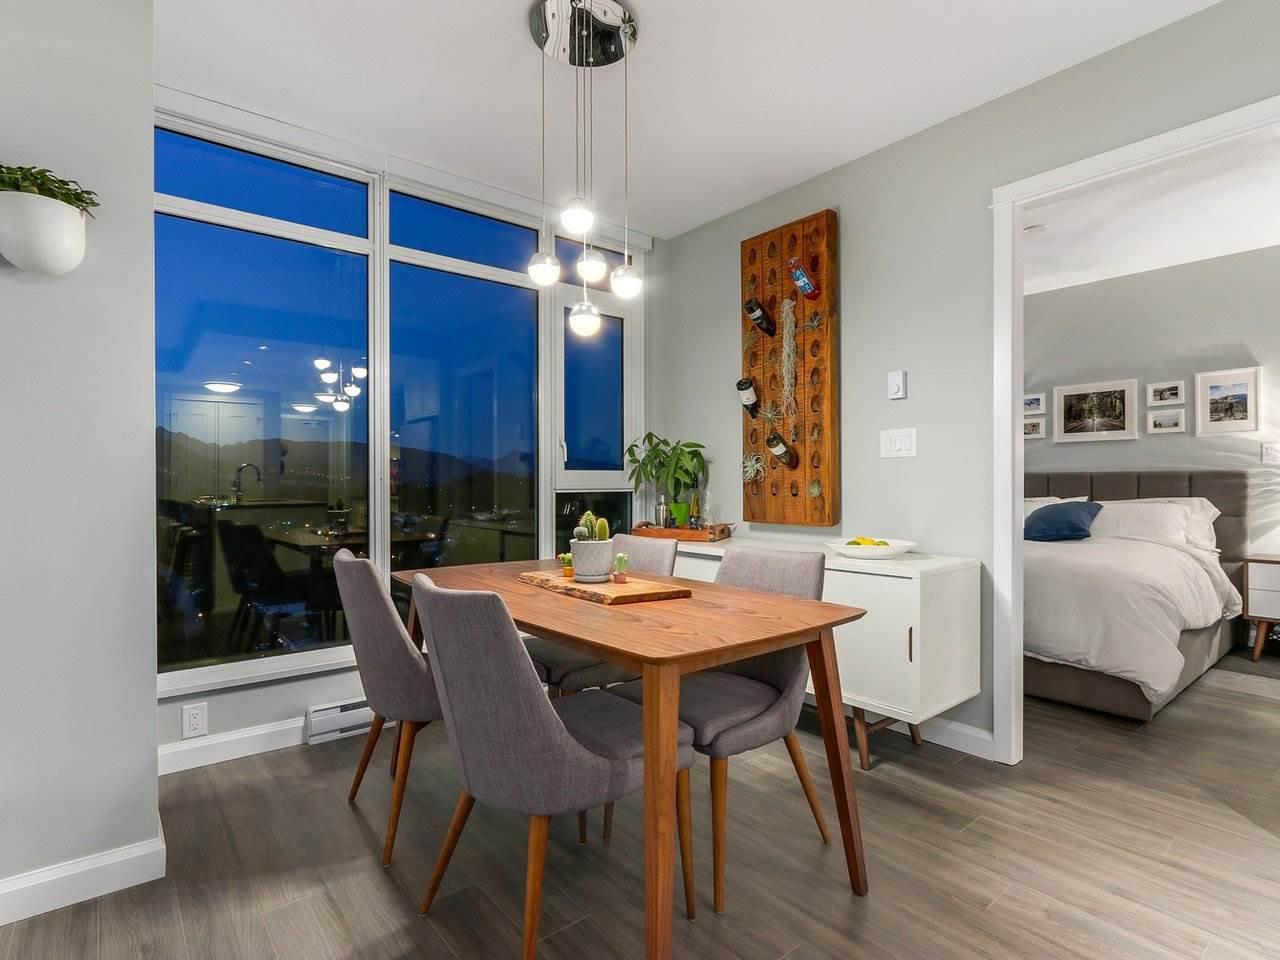 "Main Photo: 2305 520 COMO LAKE Avenue in Coquitlam: Coquitlam West Condo for sale in ""CROWN"" : MLS®# R2289559"